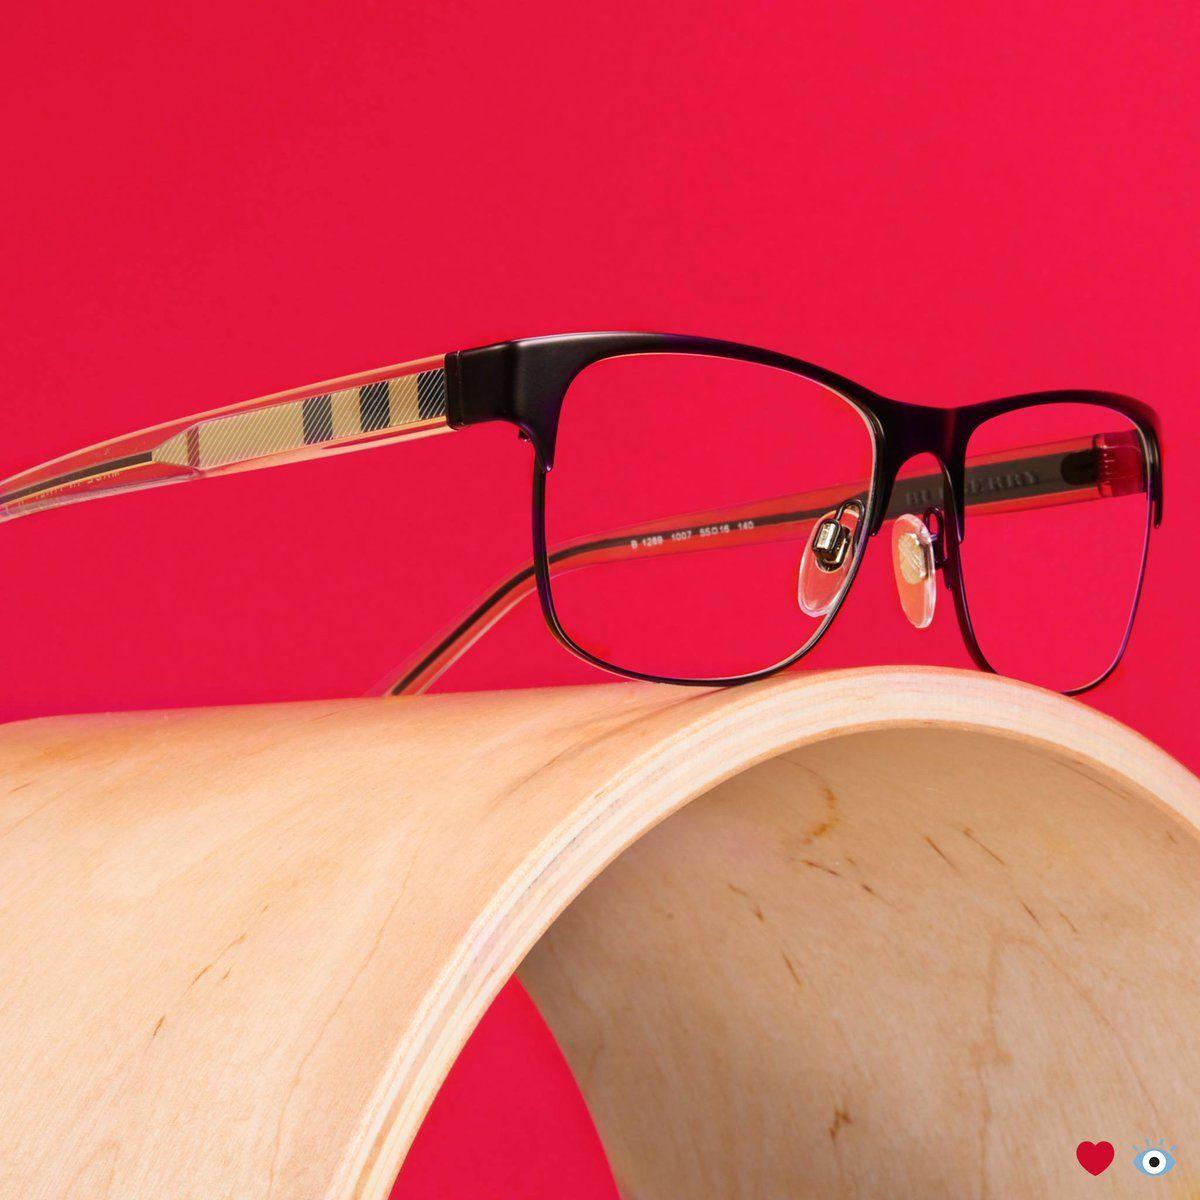 Dorable Lenscrafters Frames For Men Festooning - Ideas de Marcos ...